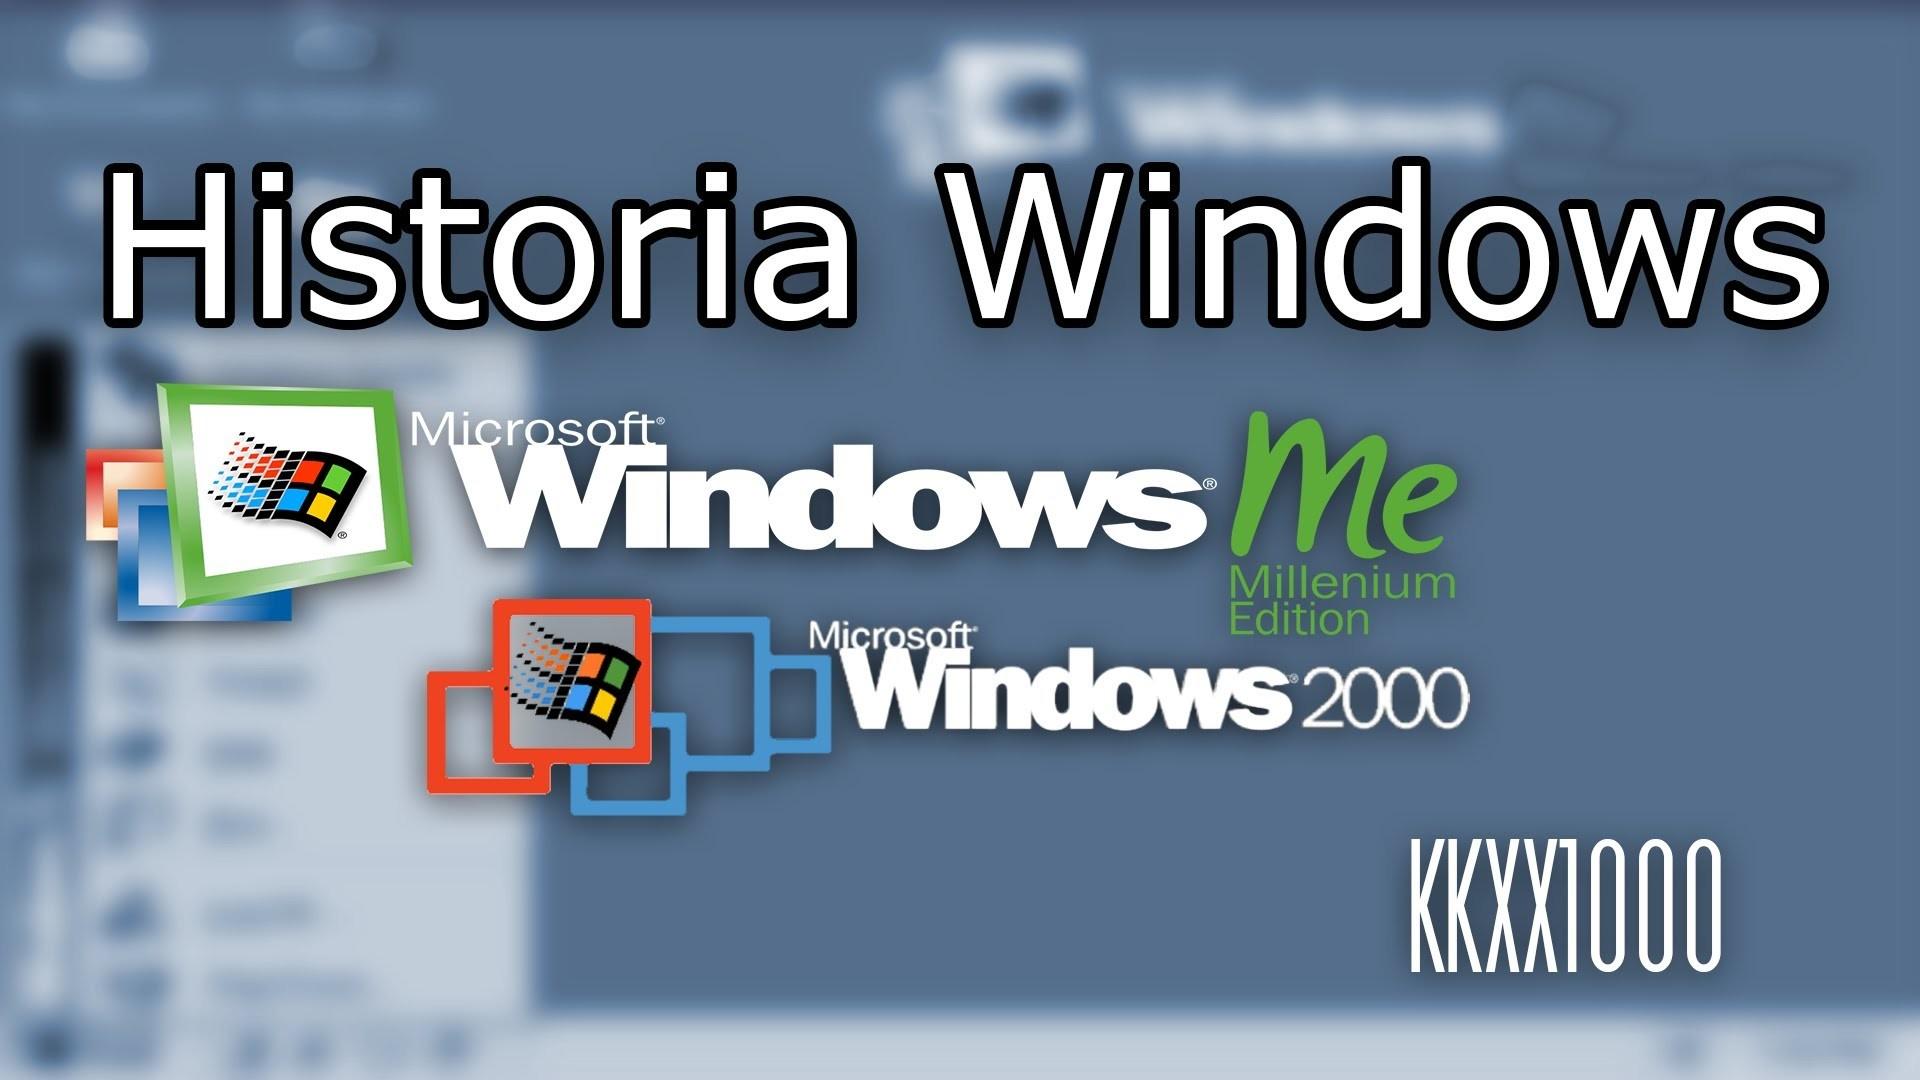 Windows rg edition - 1920x1200 Blue Windows 8 High Quality Wallpaper 4 500x312